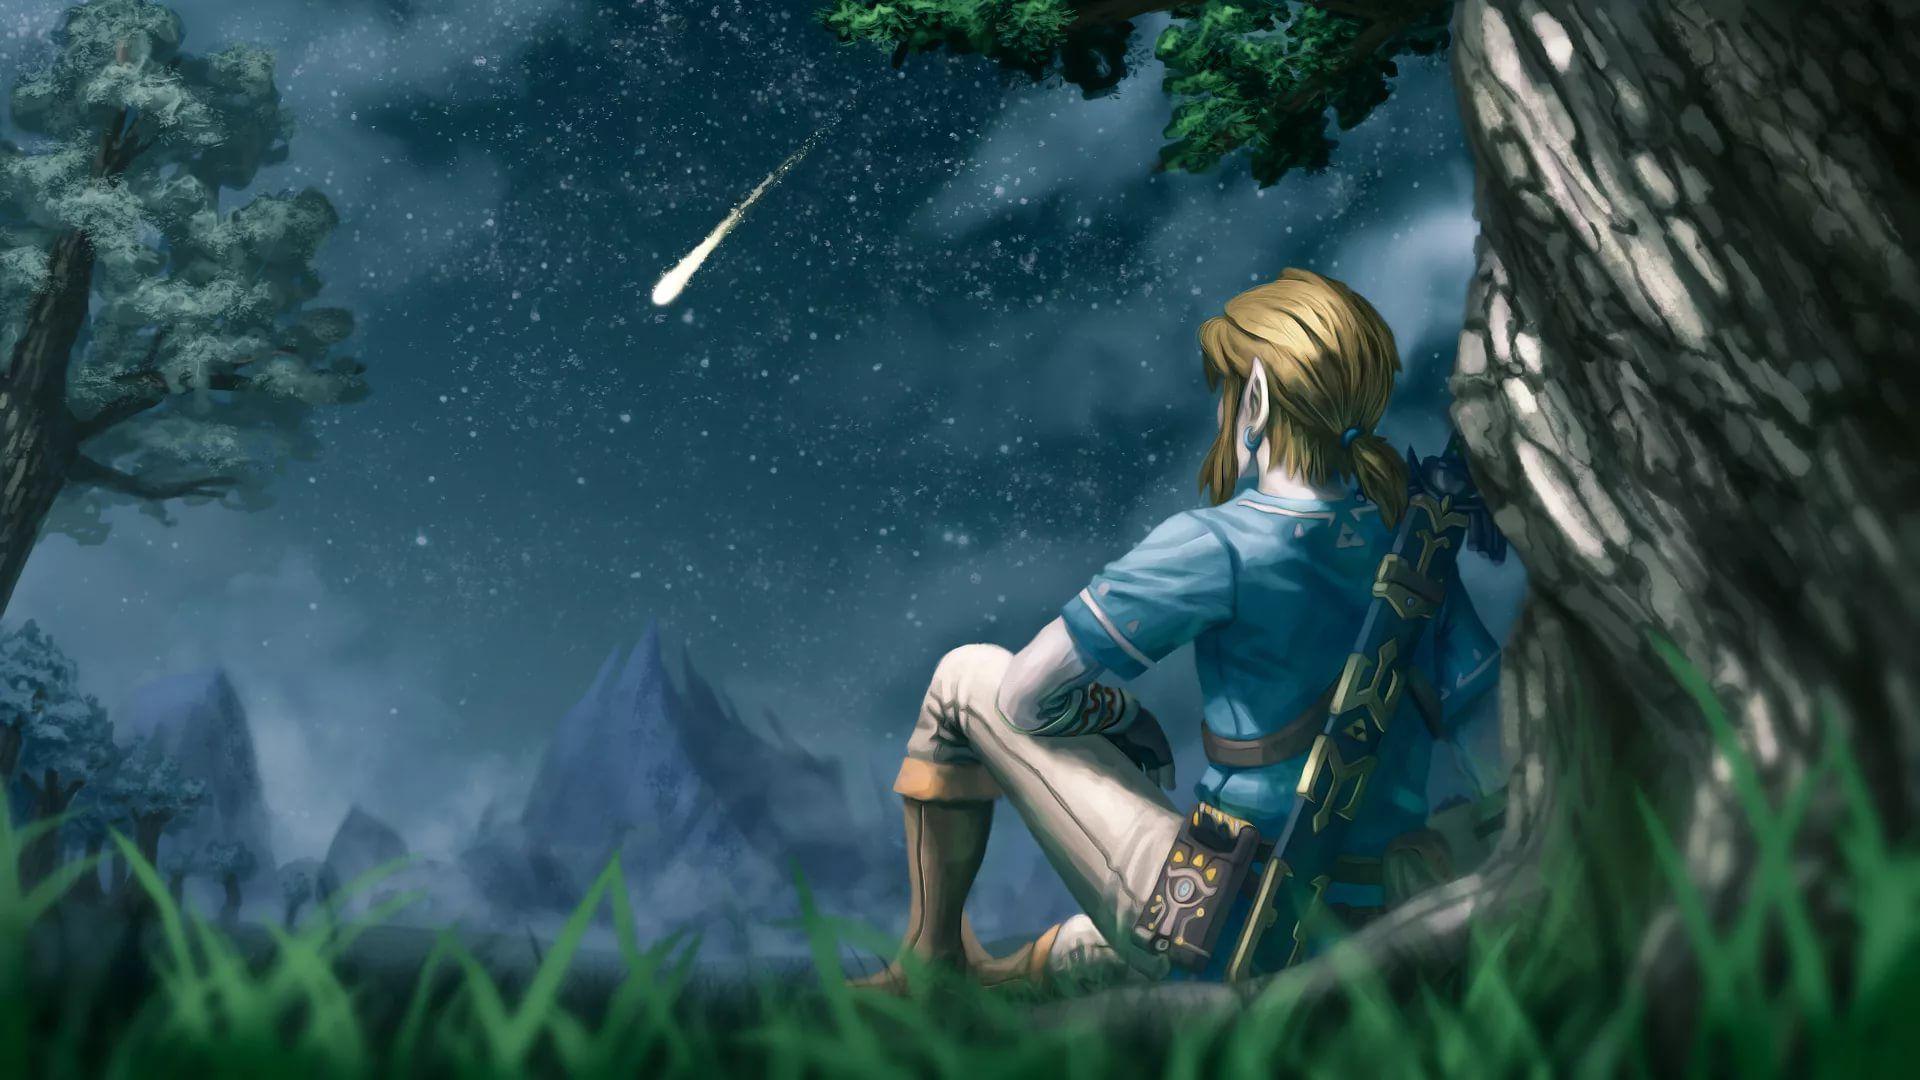 Zelda Live free hd wallpaper